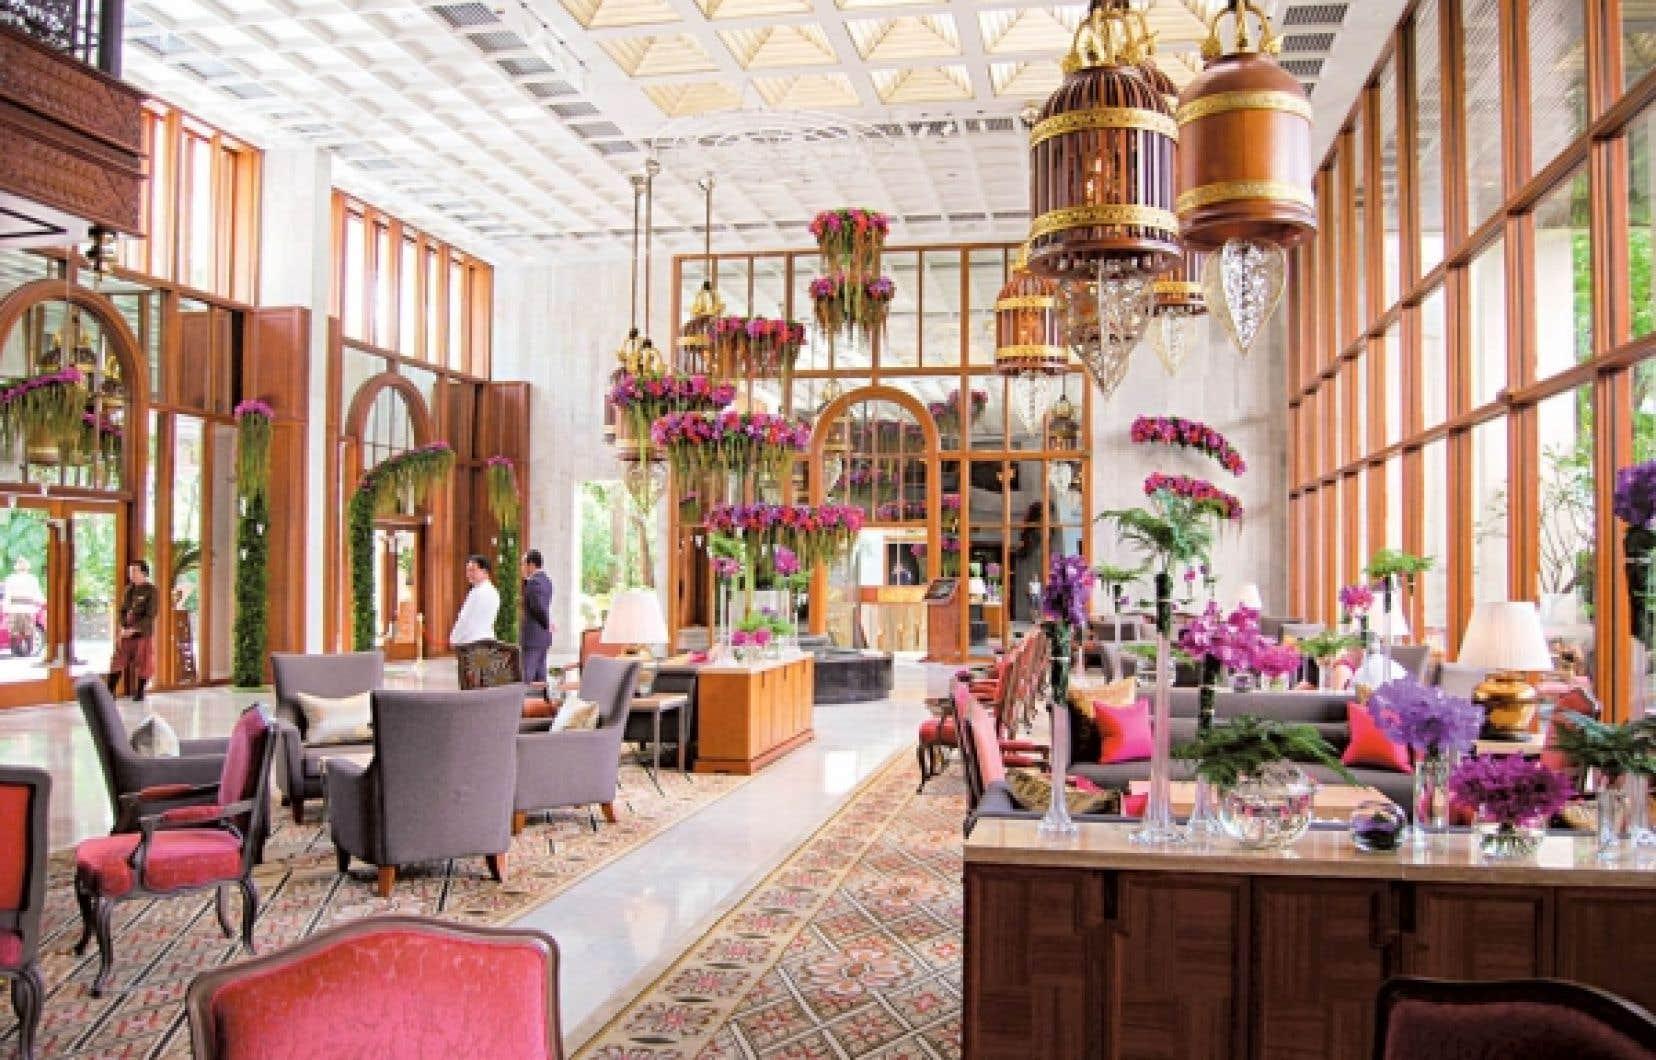 Le hall fleuri de l'hôtel Oriental à Bangkok.